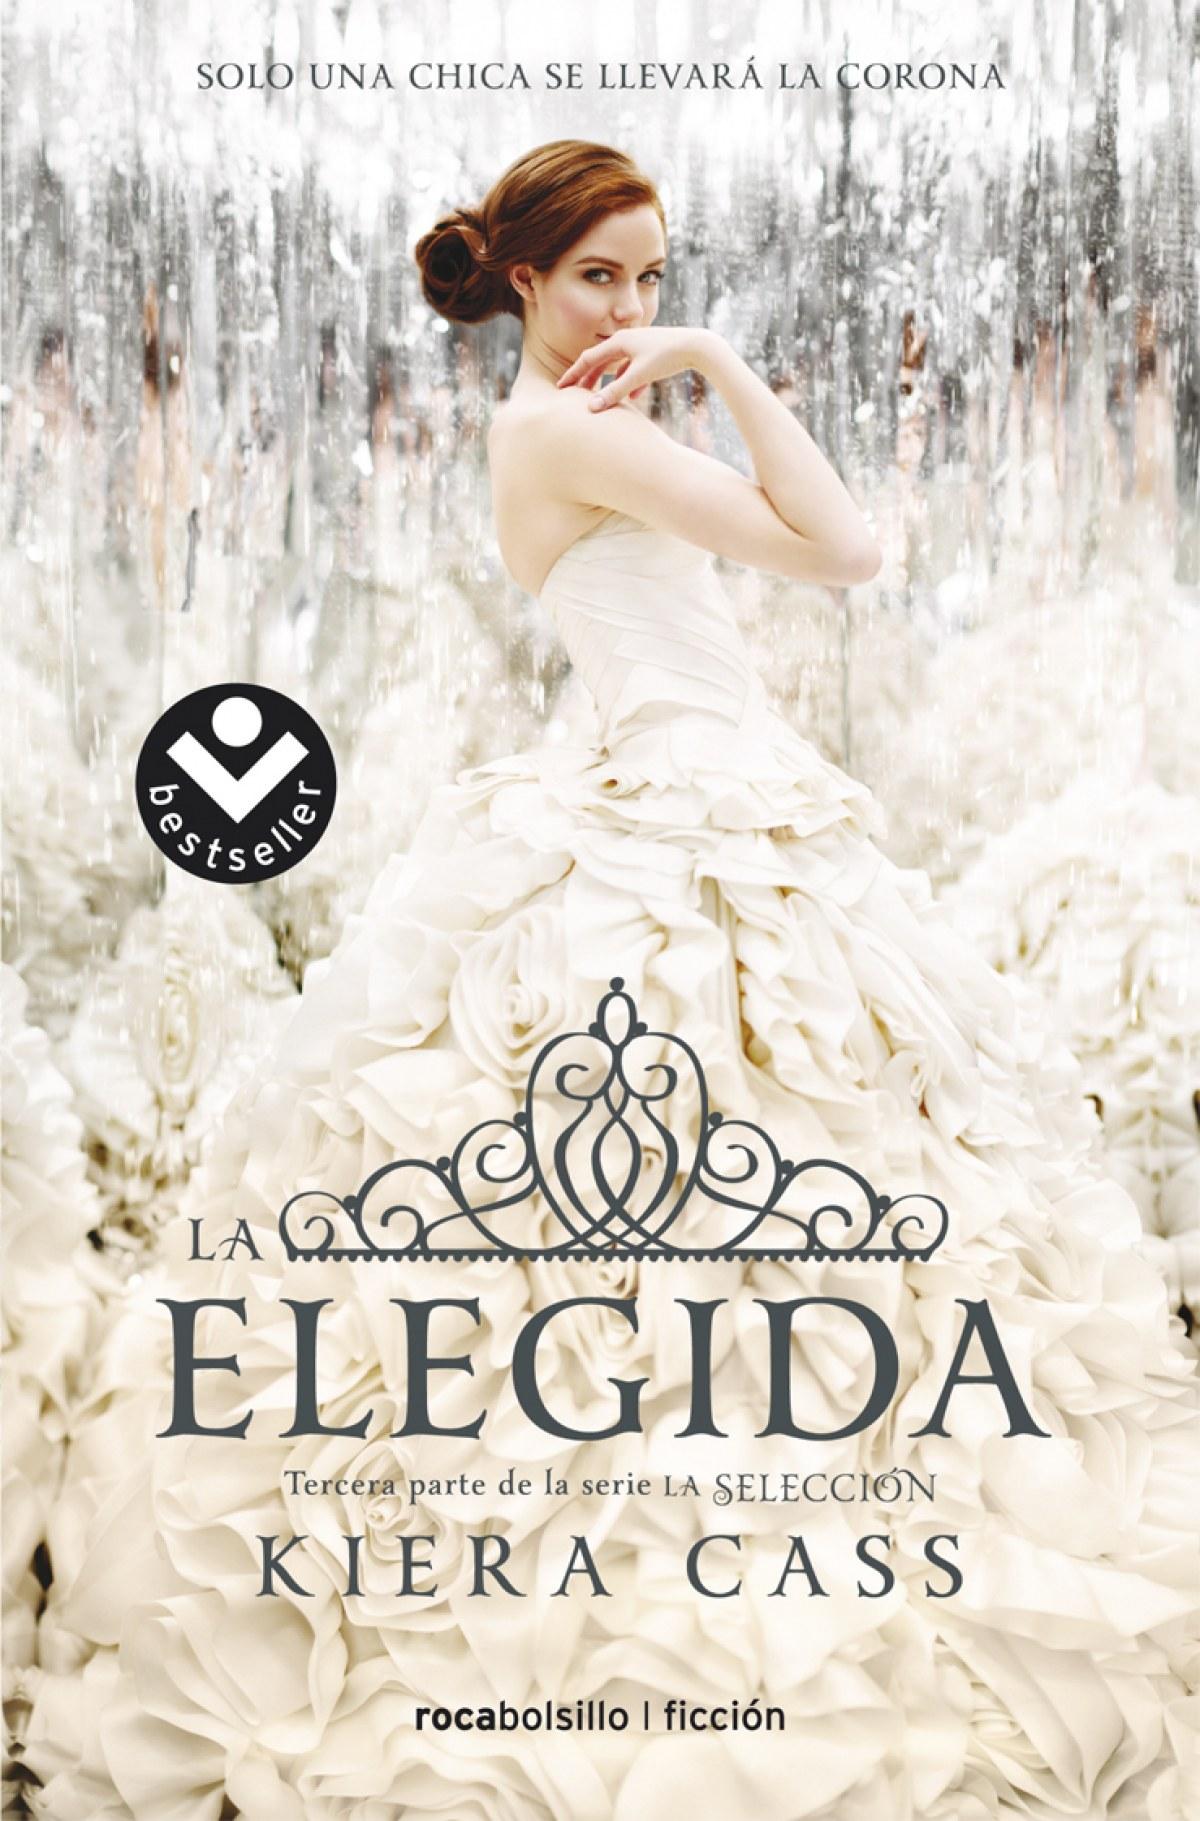 LA ELEGIDA 9788416240623